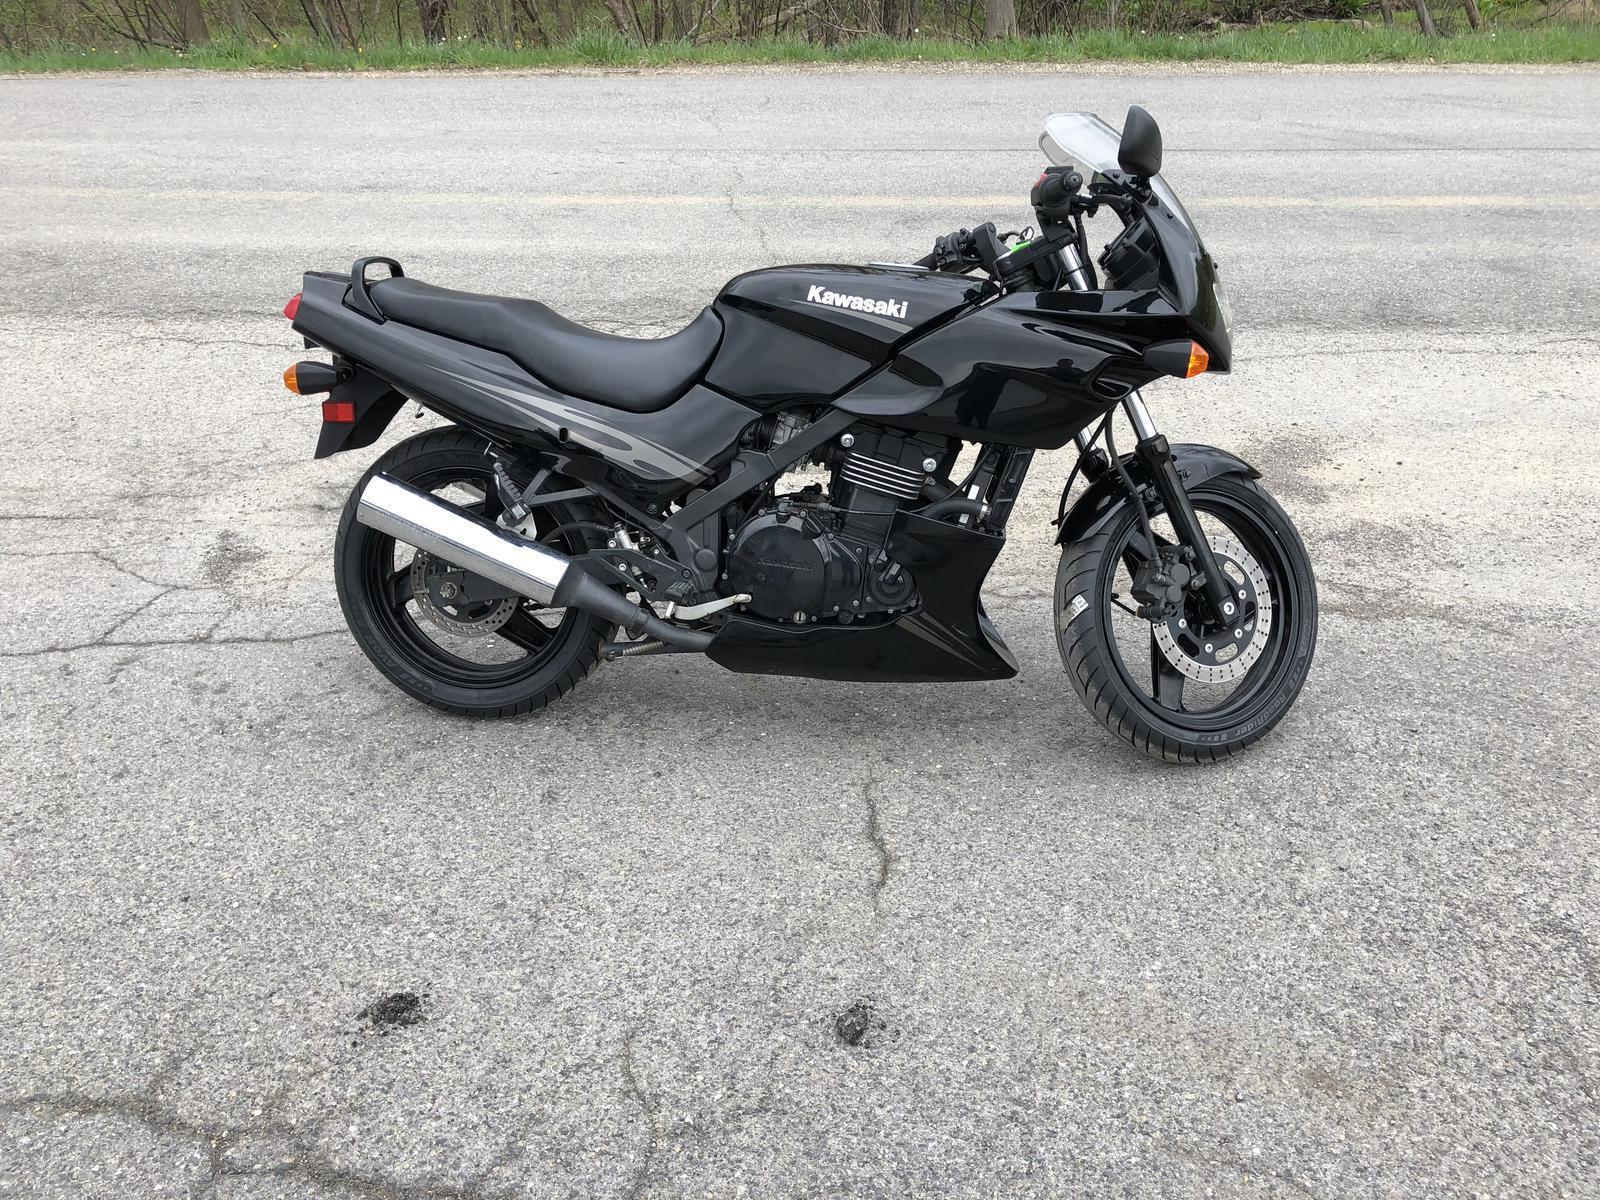 2009 kawasaki ninja 500r for sale in seneca, pa. world of wheels